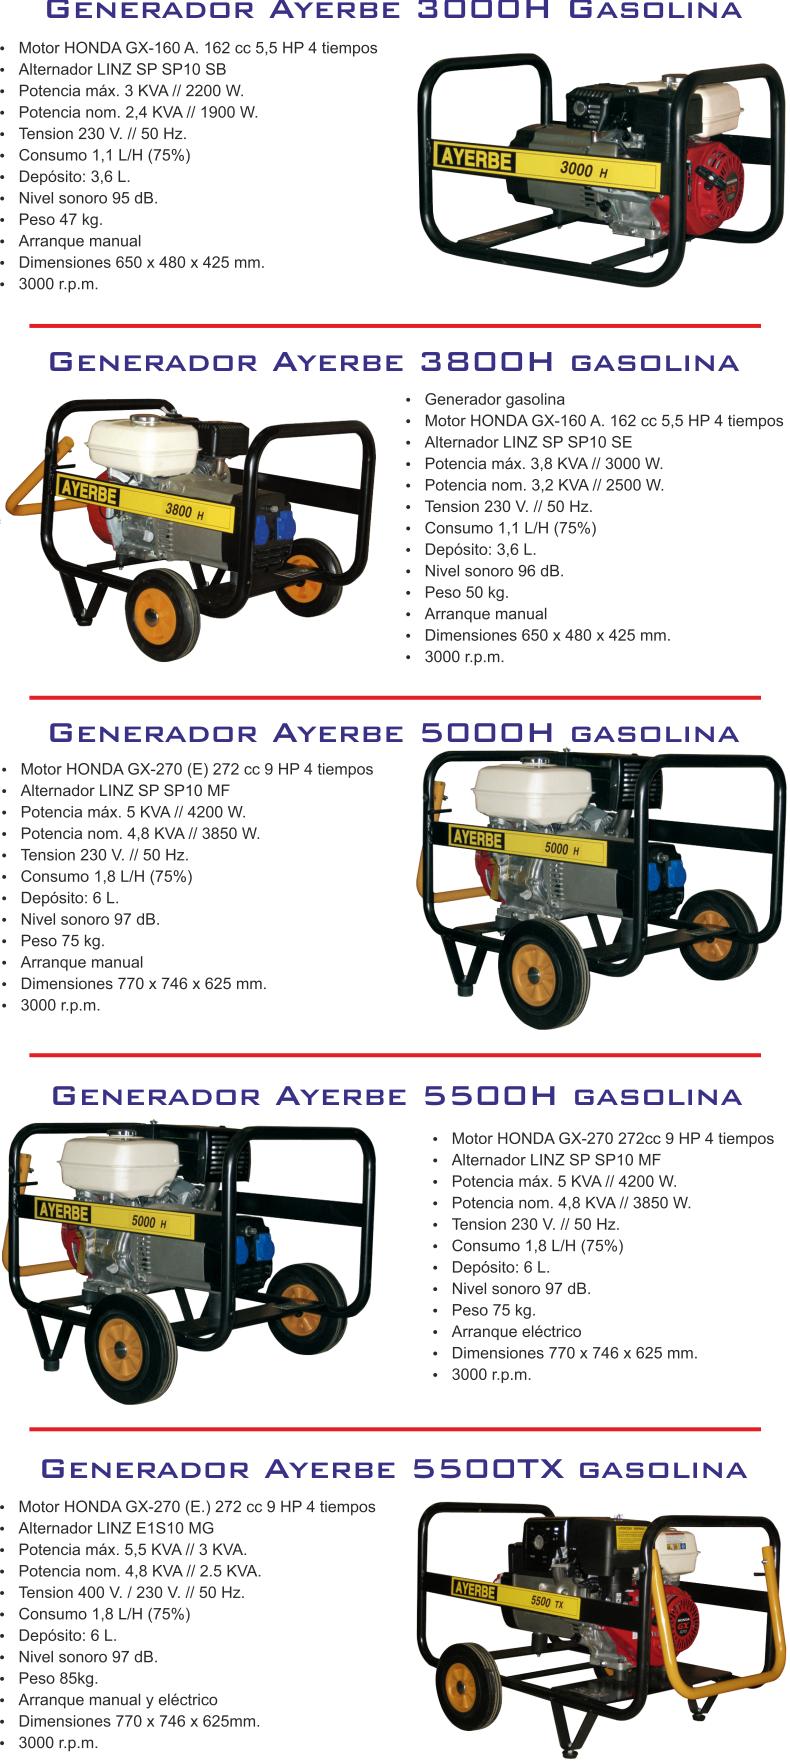 GeneradoresAyerbeok